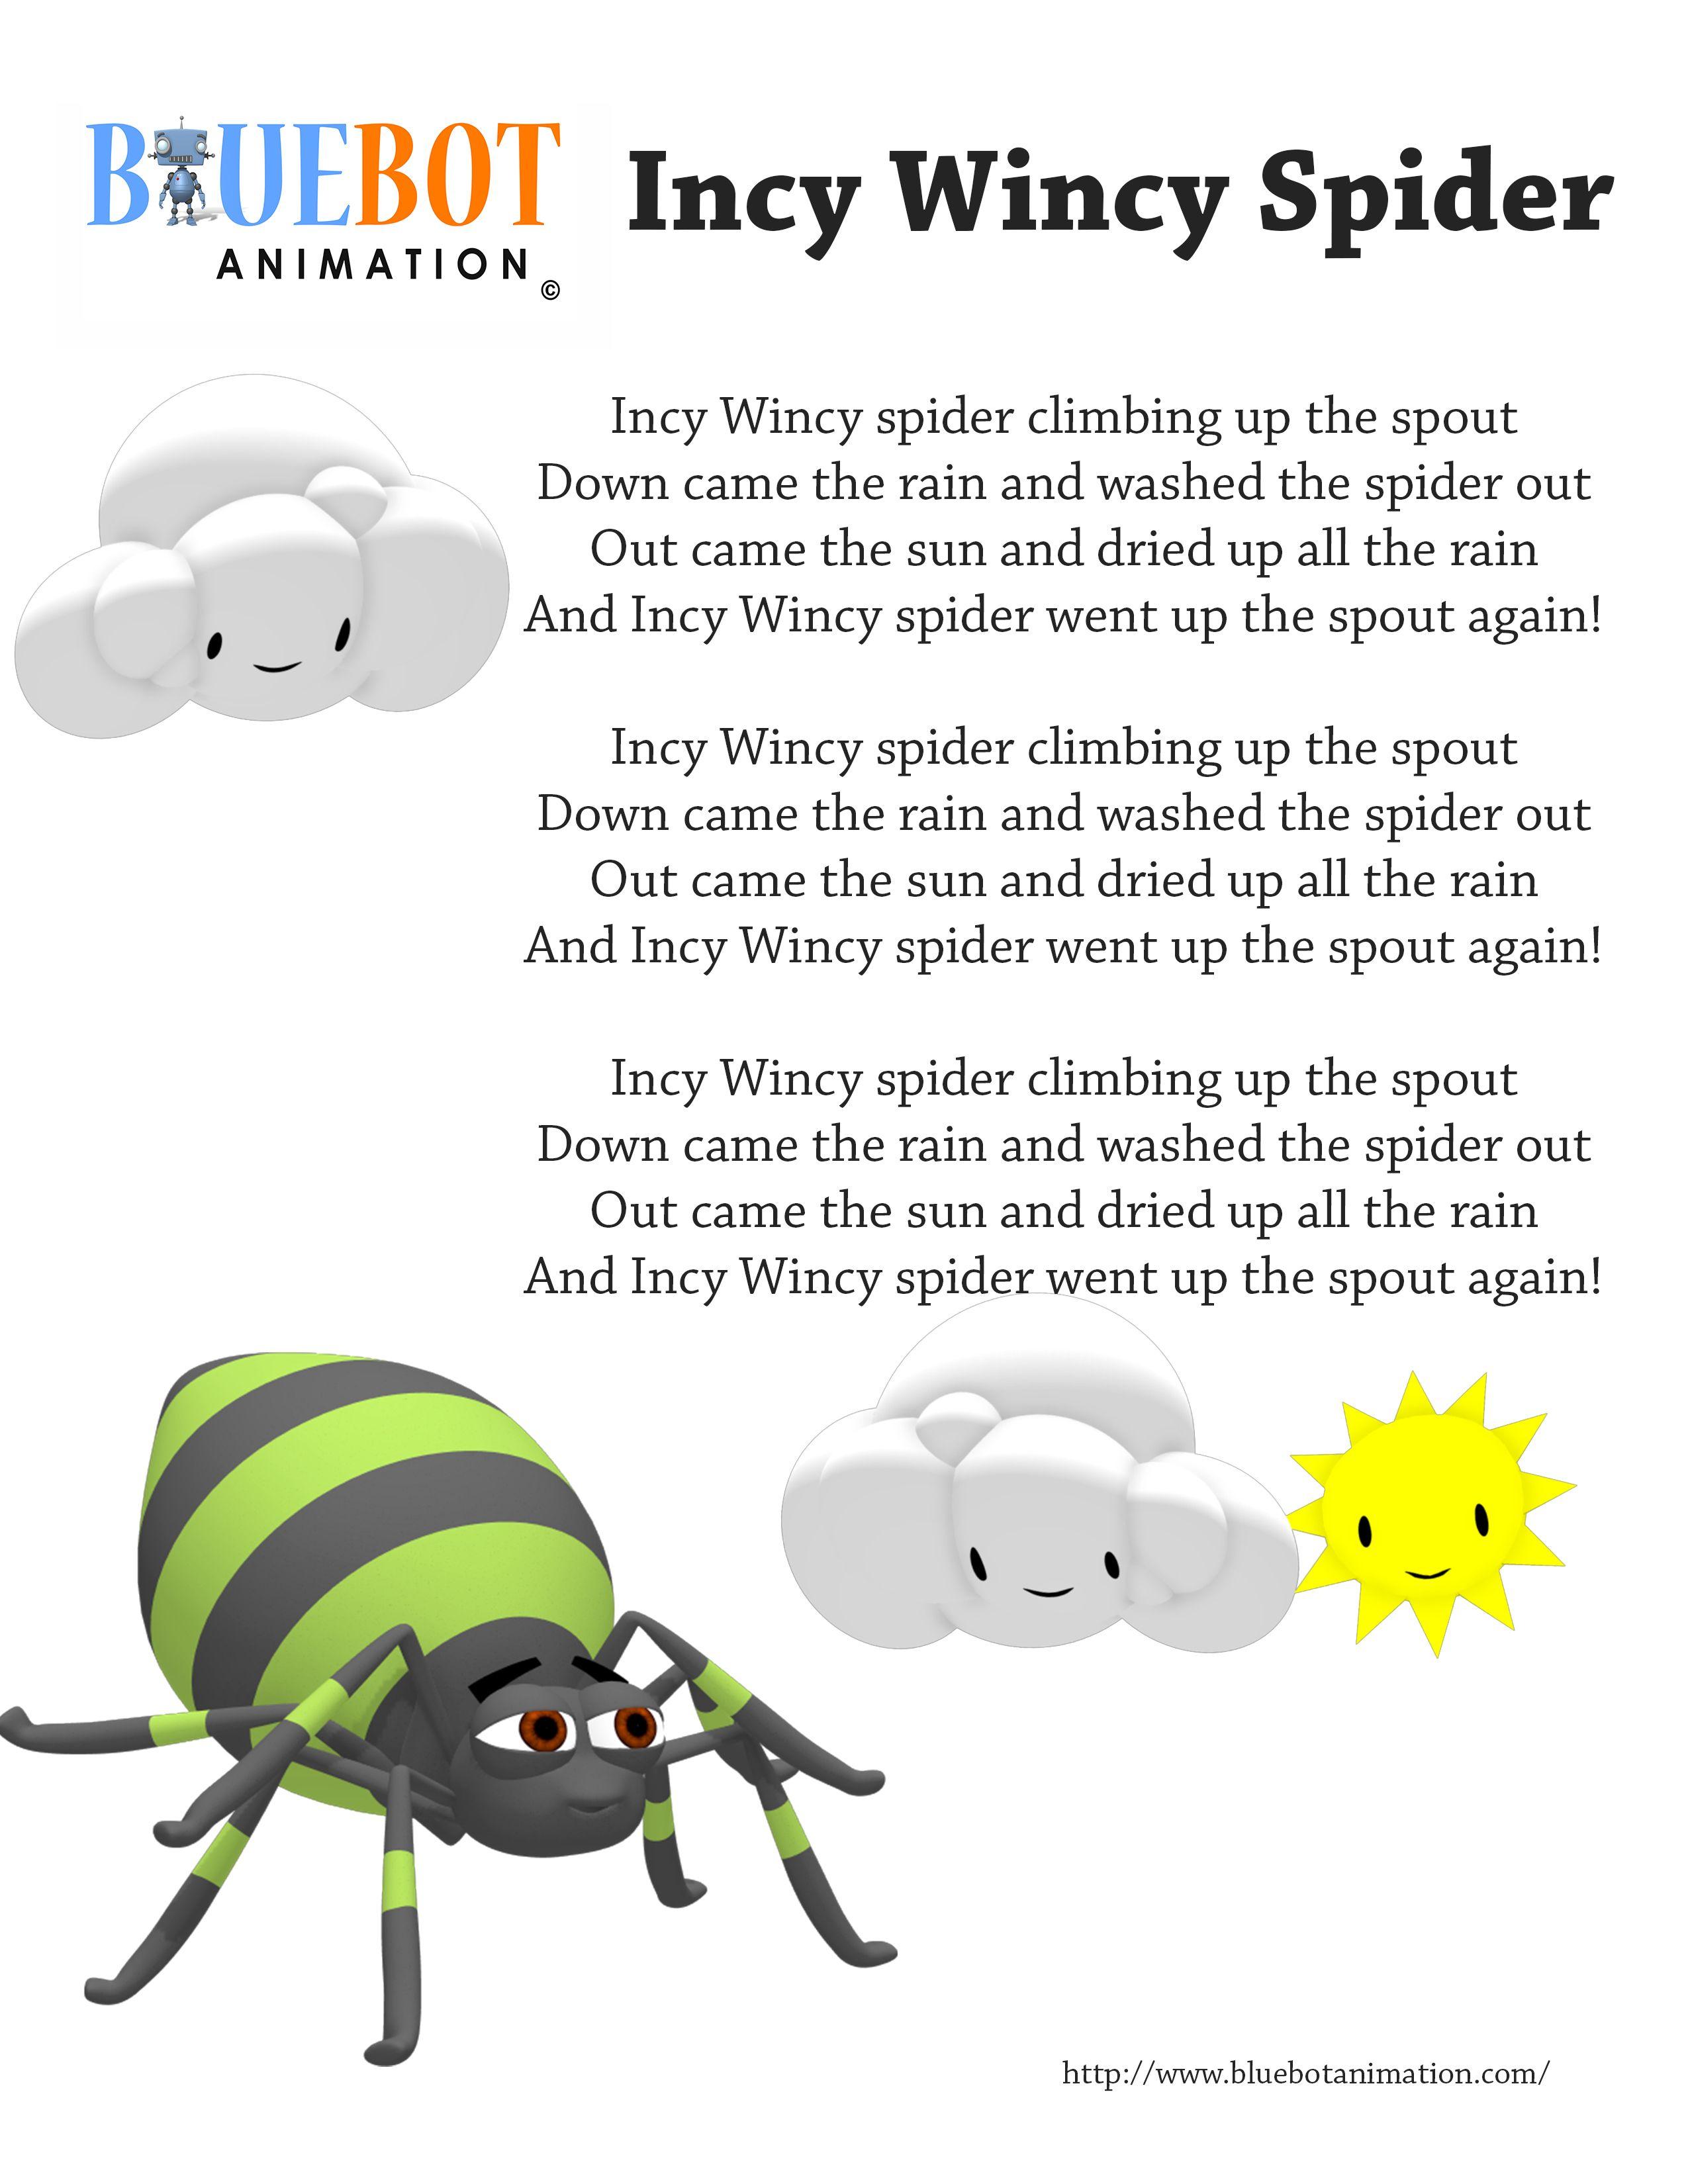 Incy Wincy Spider Itsy Bitsy Spider Nursery Rhyme Lyrics Free Printable Nursery Rhyme Lyrics